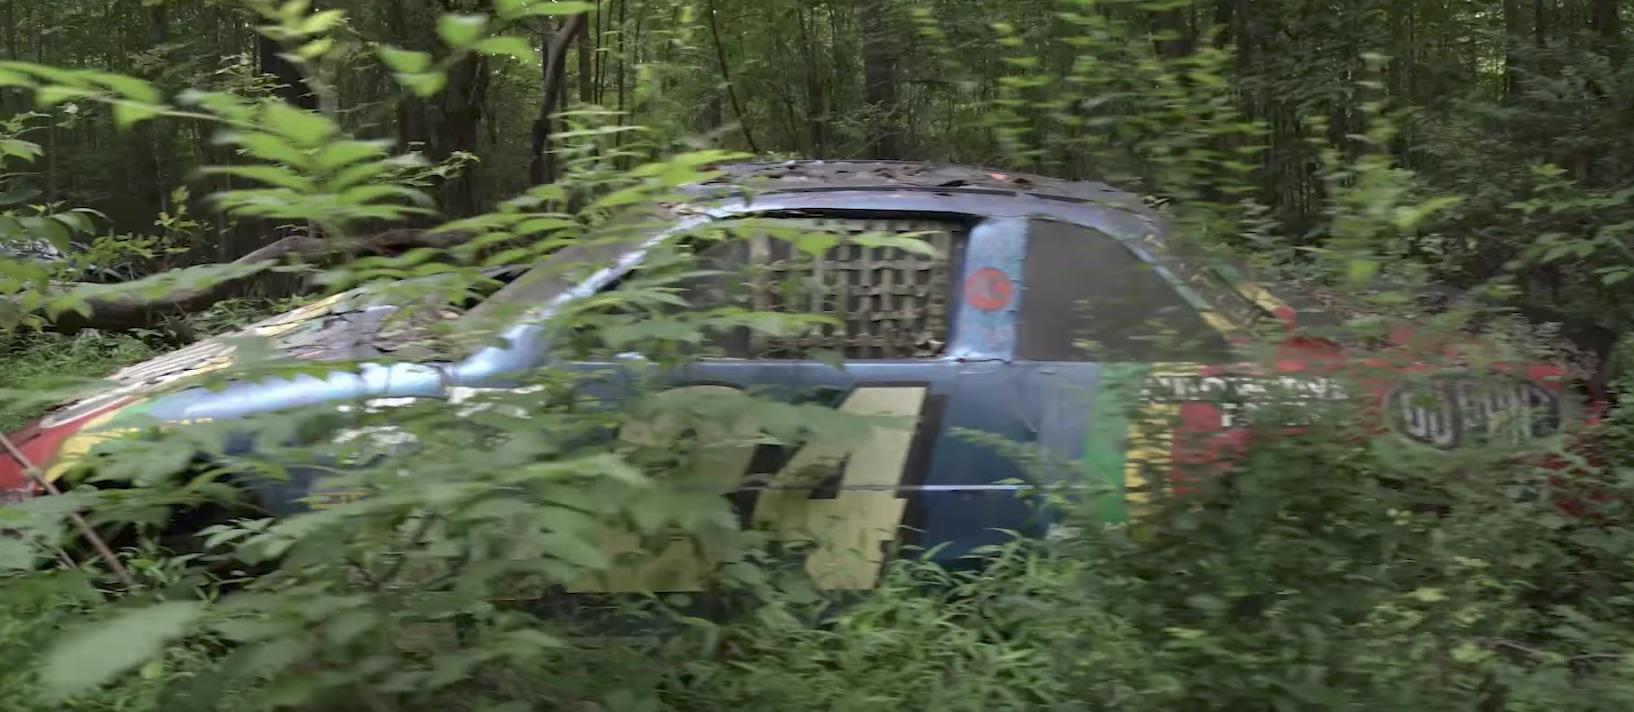 dale earnhardt jr owns  secret race car graveyard